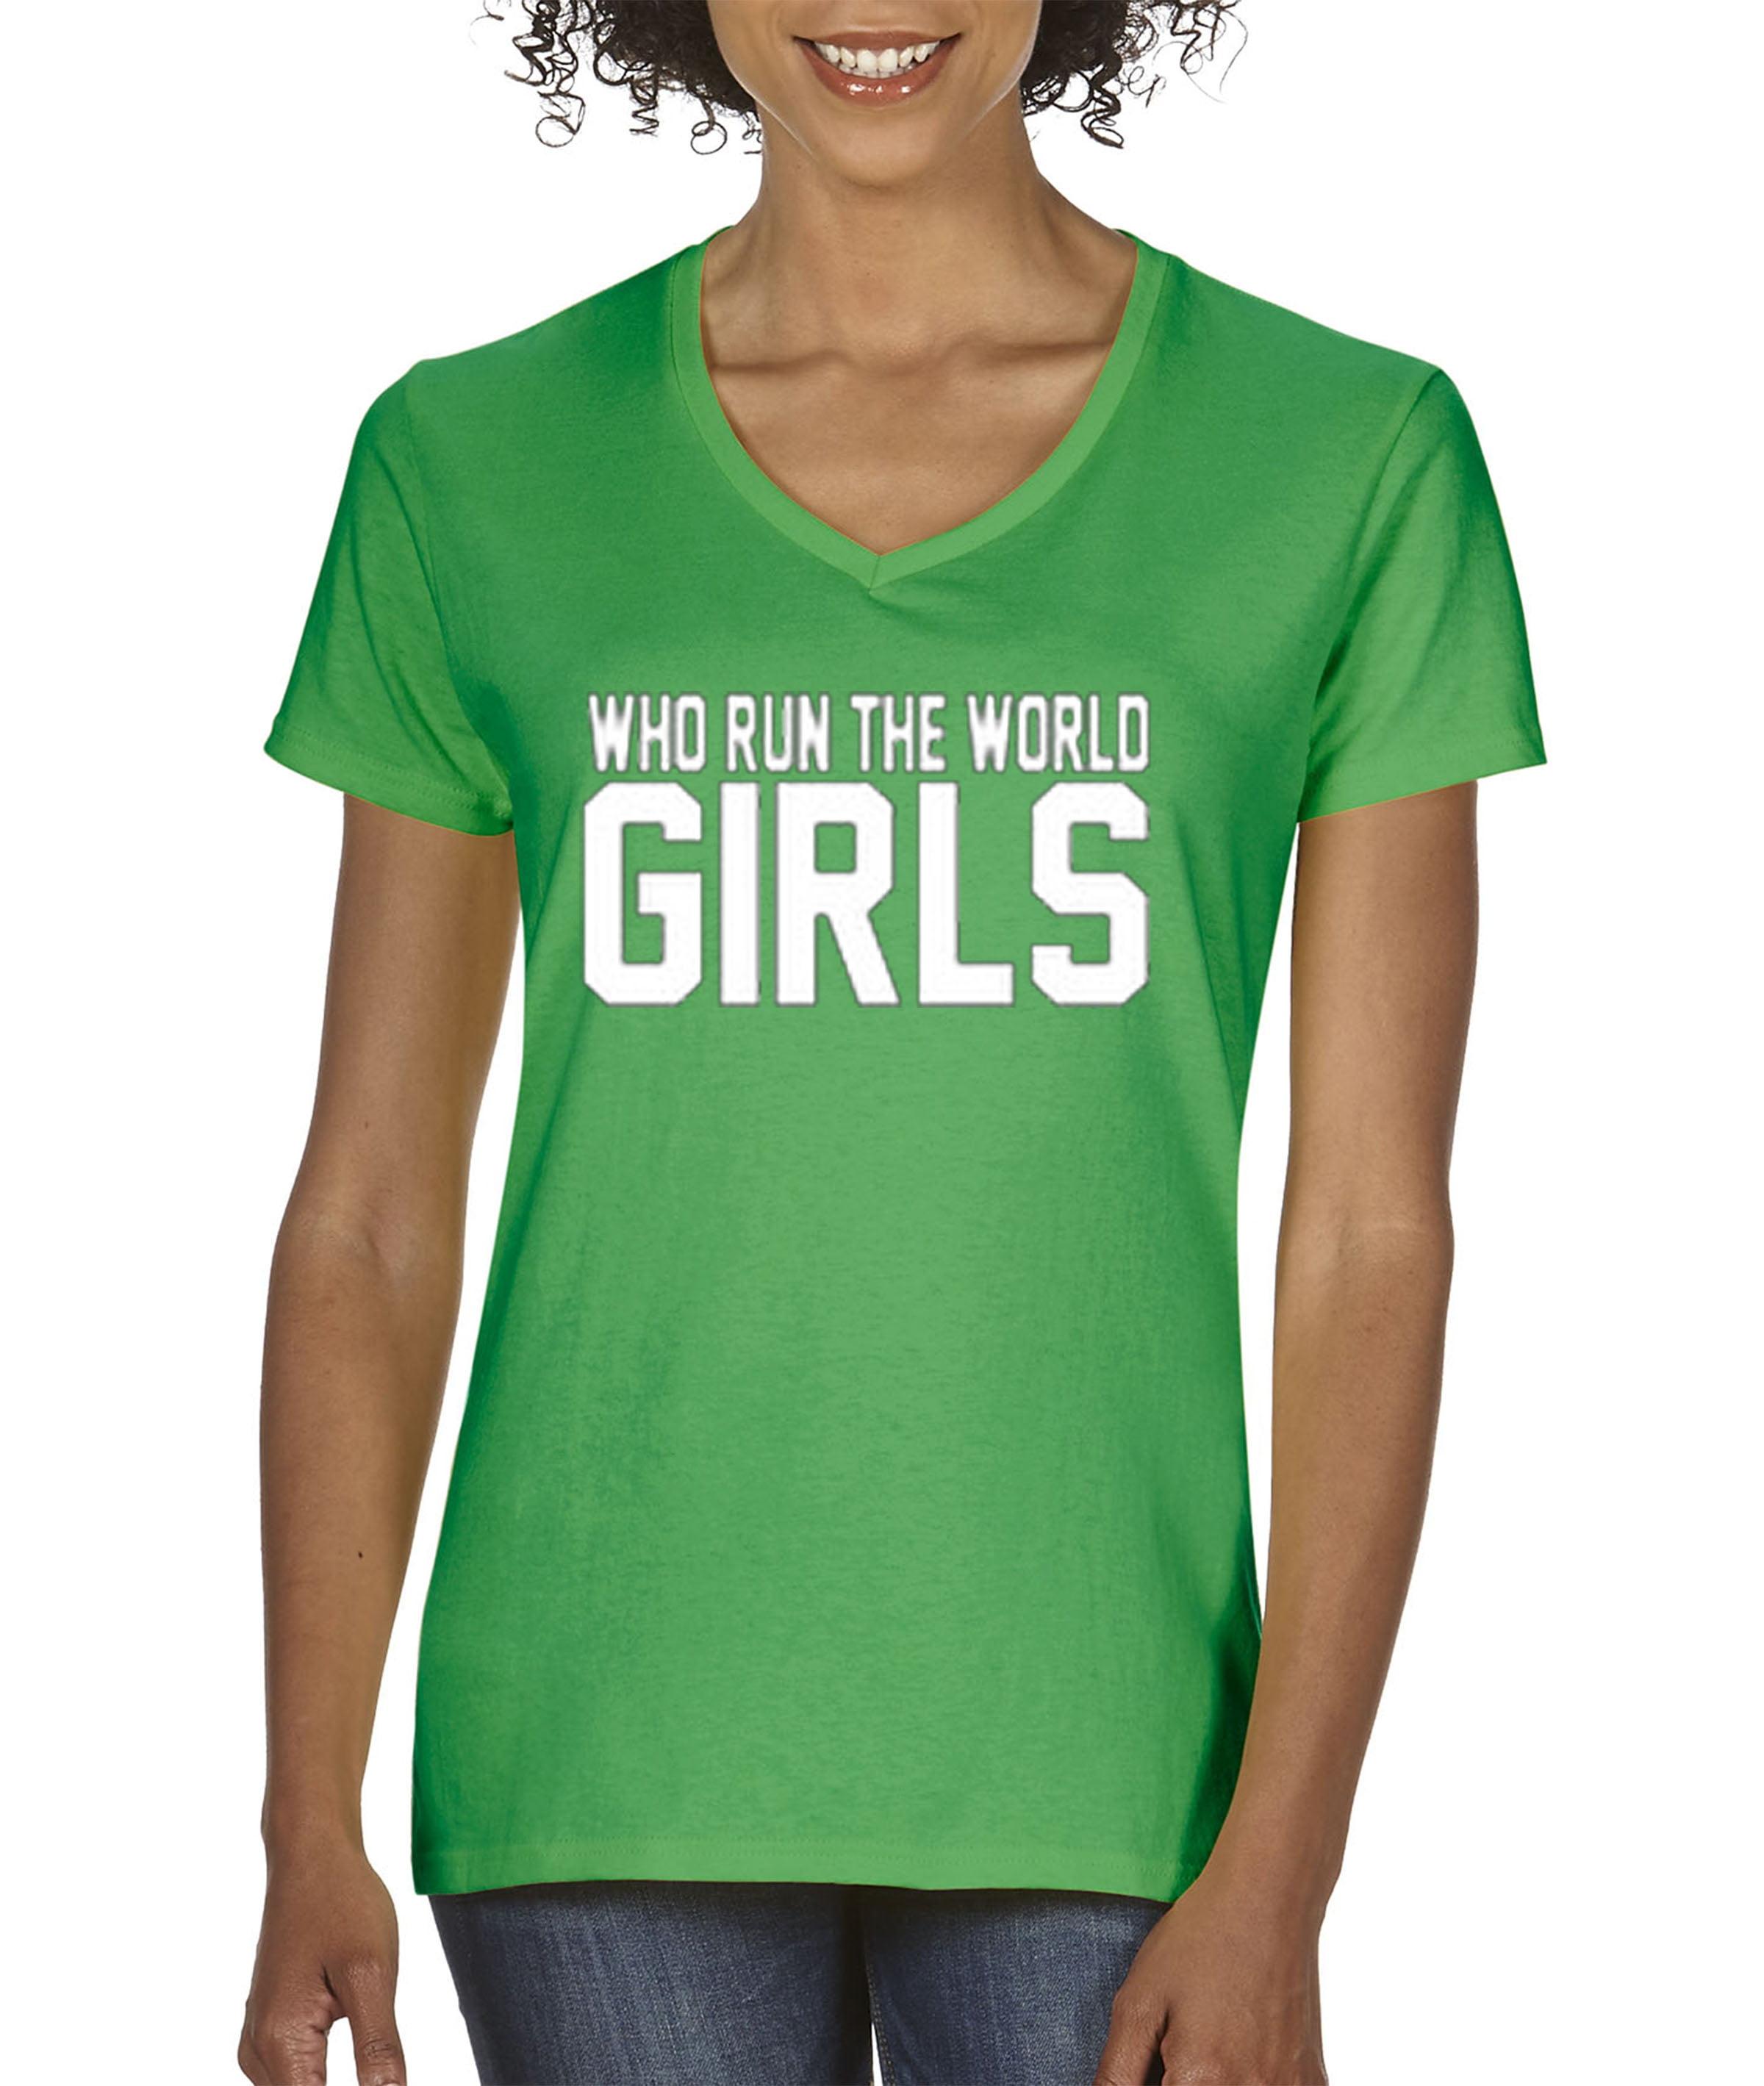 New Way 383 Women's V-Neck T-Shirt Who Run The World Girls by